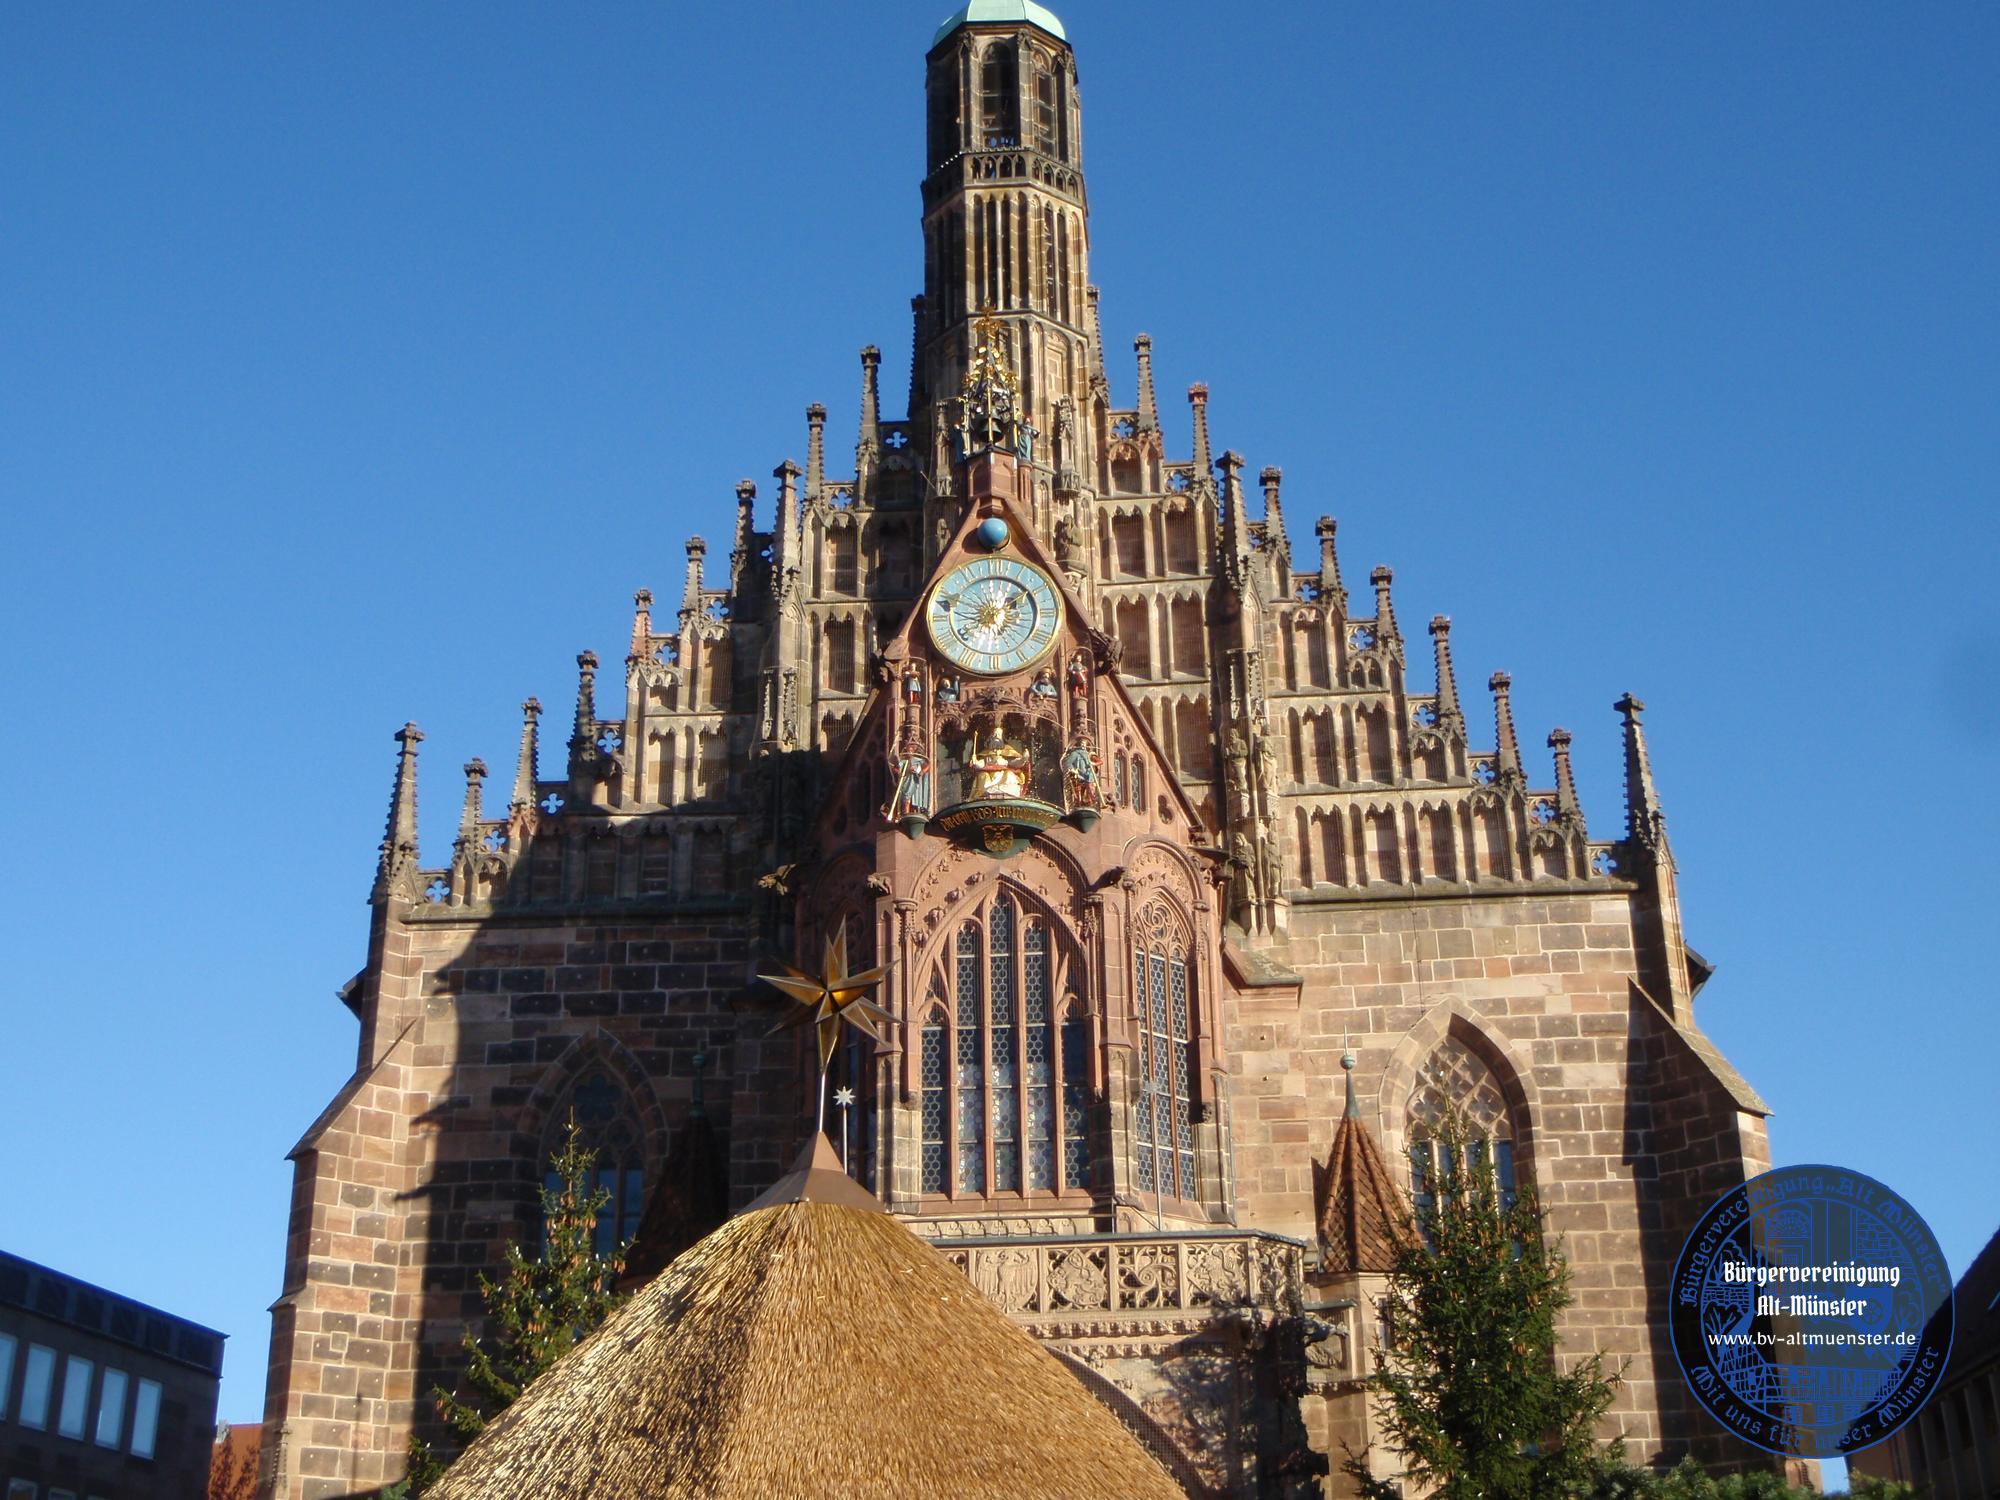 2011: Weihnachtsmarkt Nürnberg · BVAM · Bürgervereinigung Alt-Münster e.V.